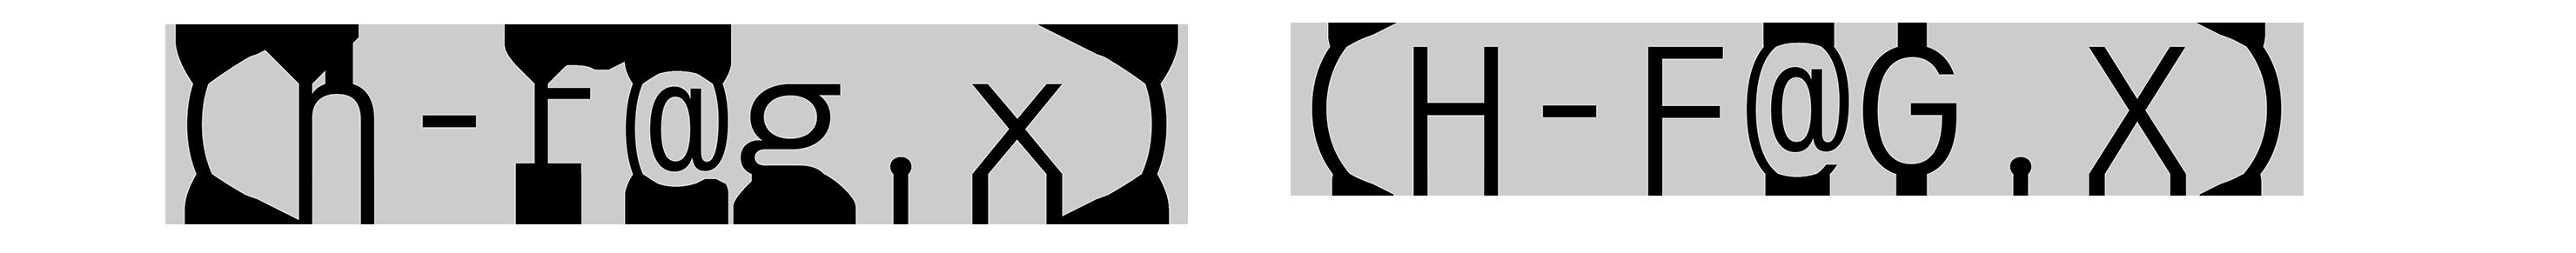 Typeface-Heimat-Mono-F01-Atlas-Font-Foundry